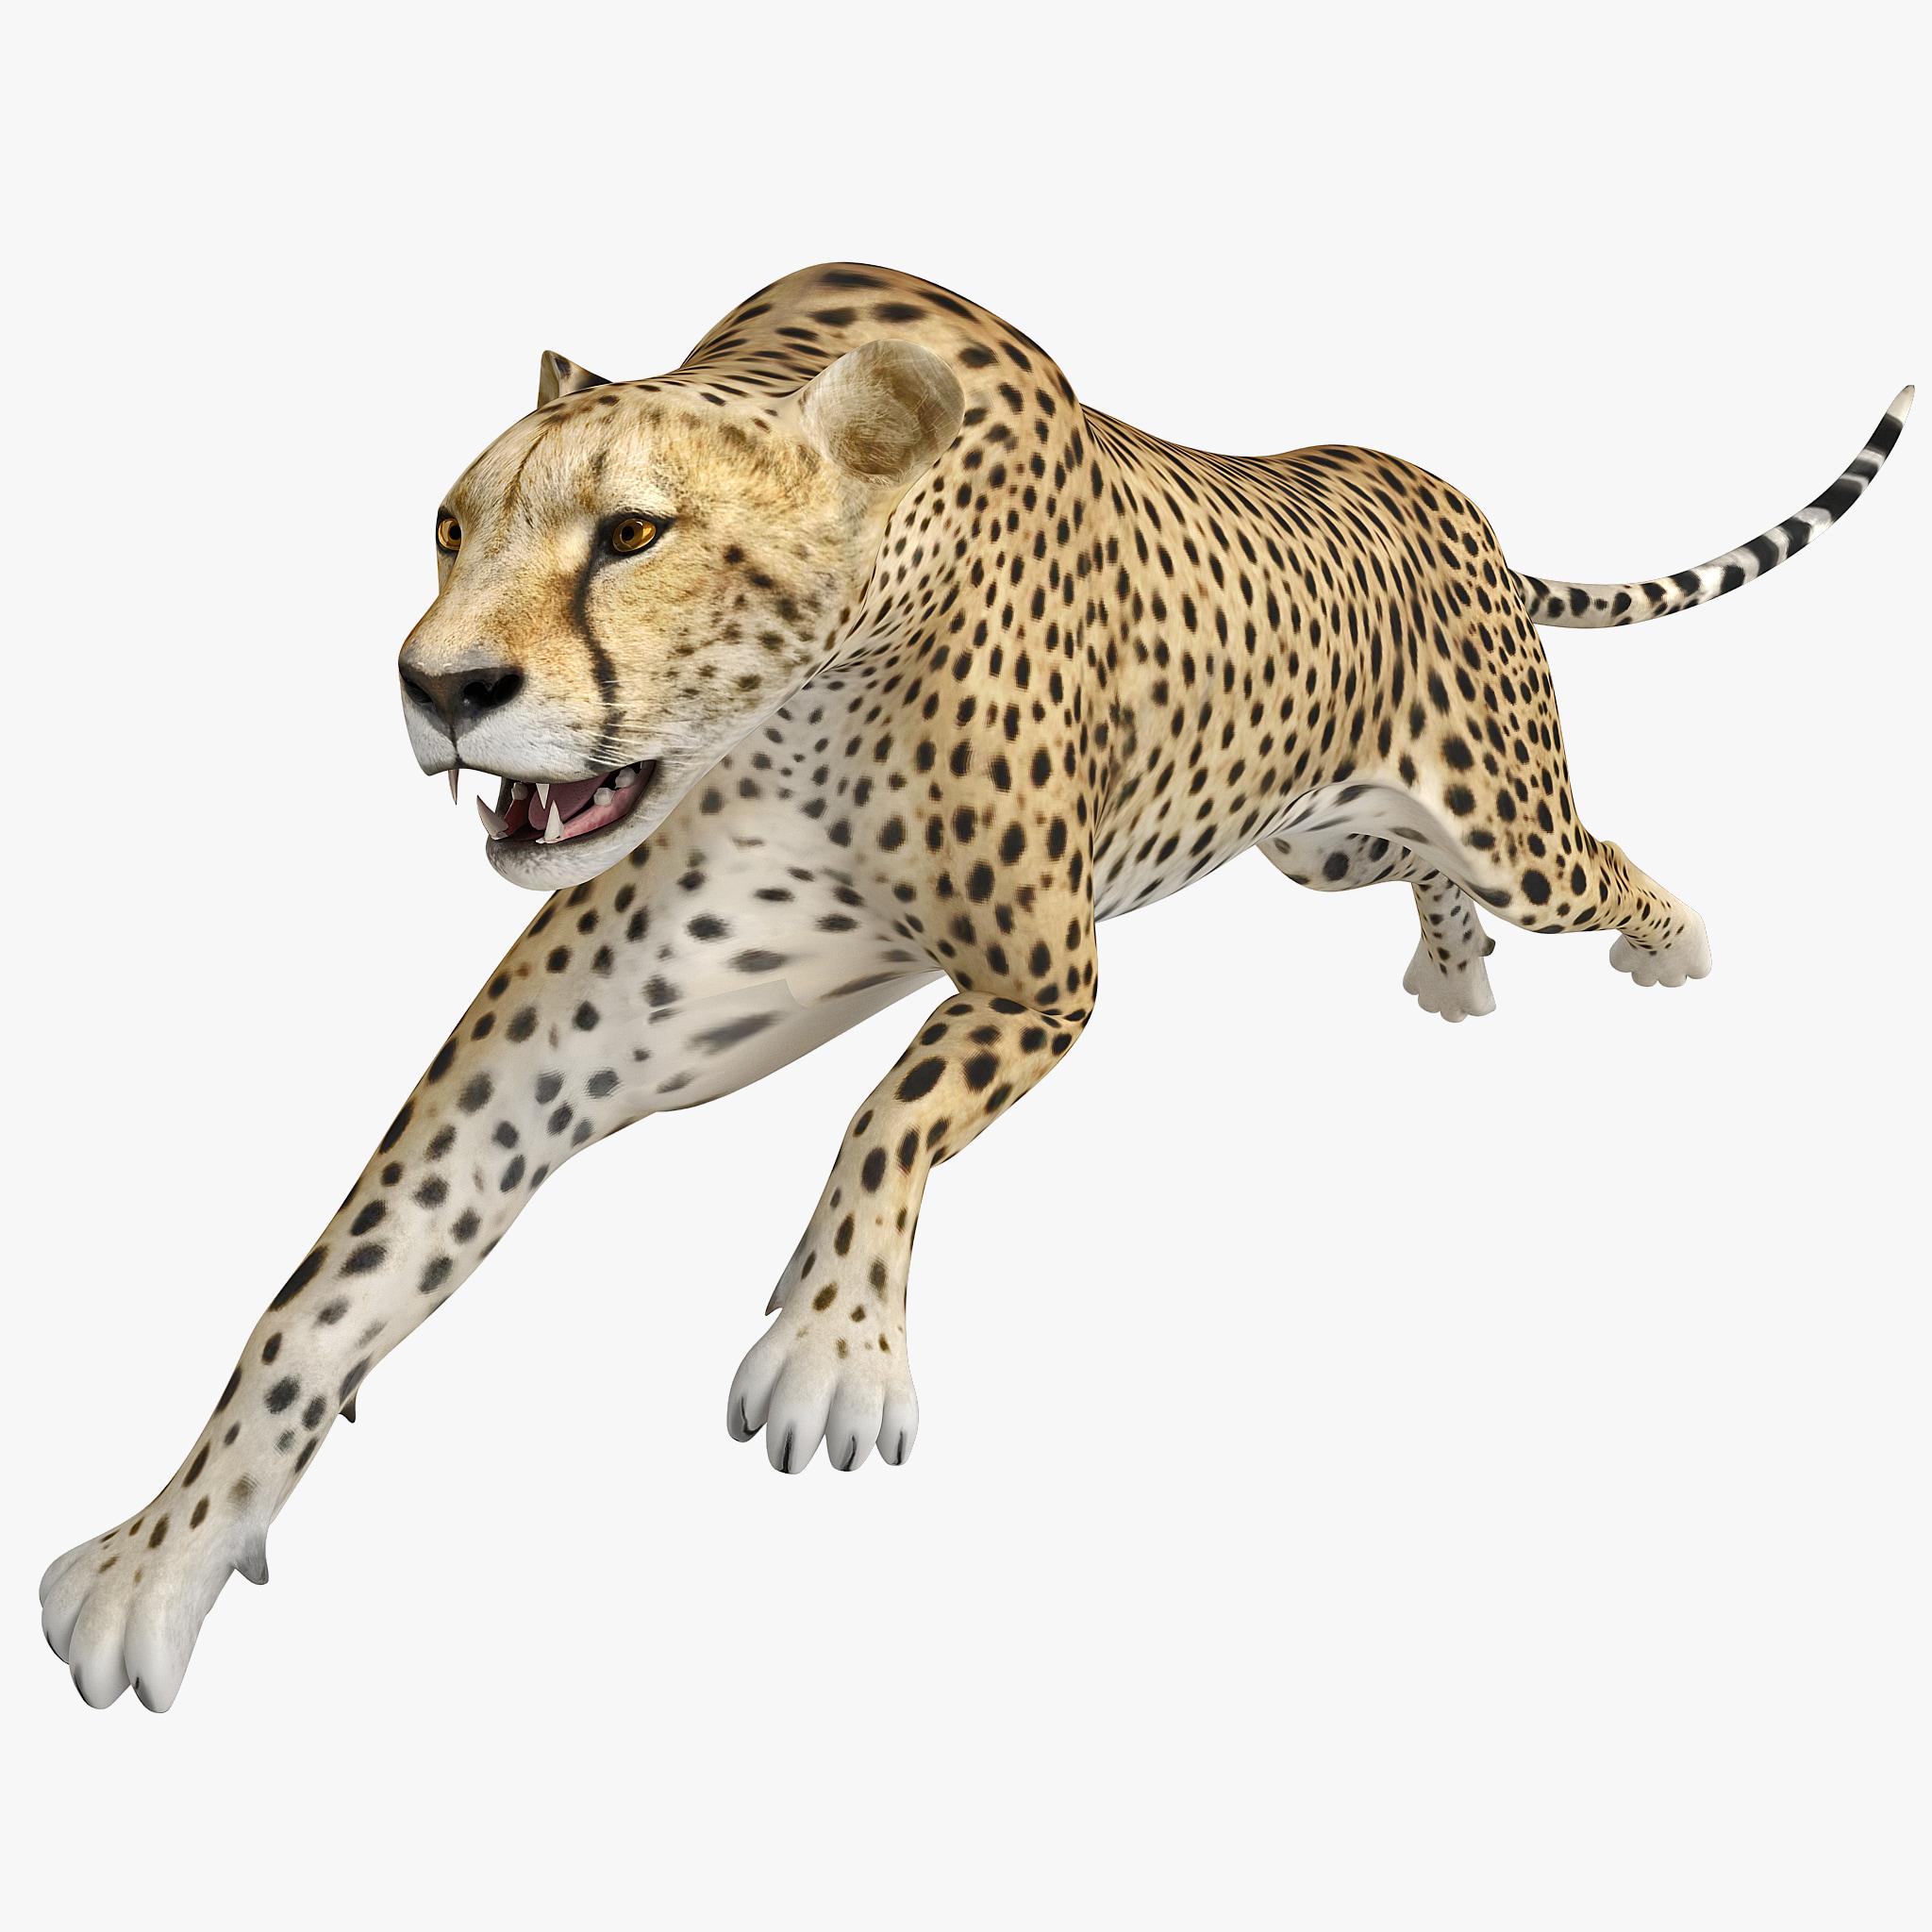 Cheetah 2 Pose 2_1.jpg